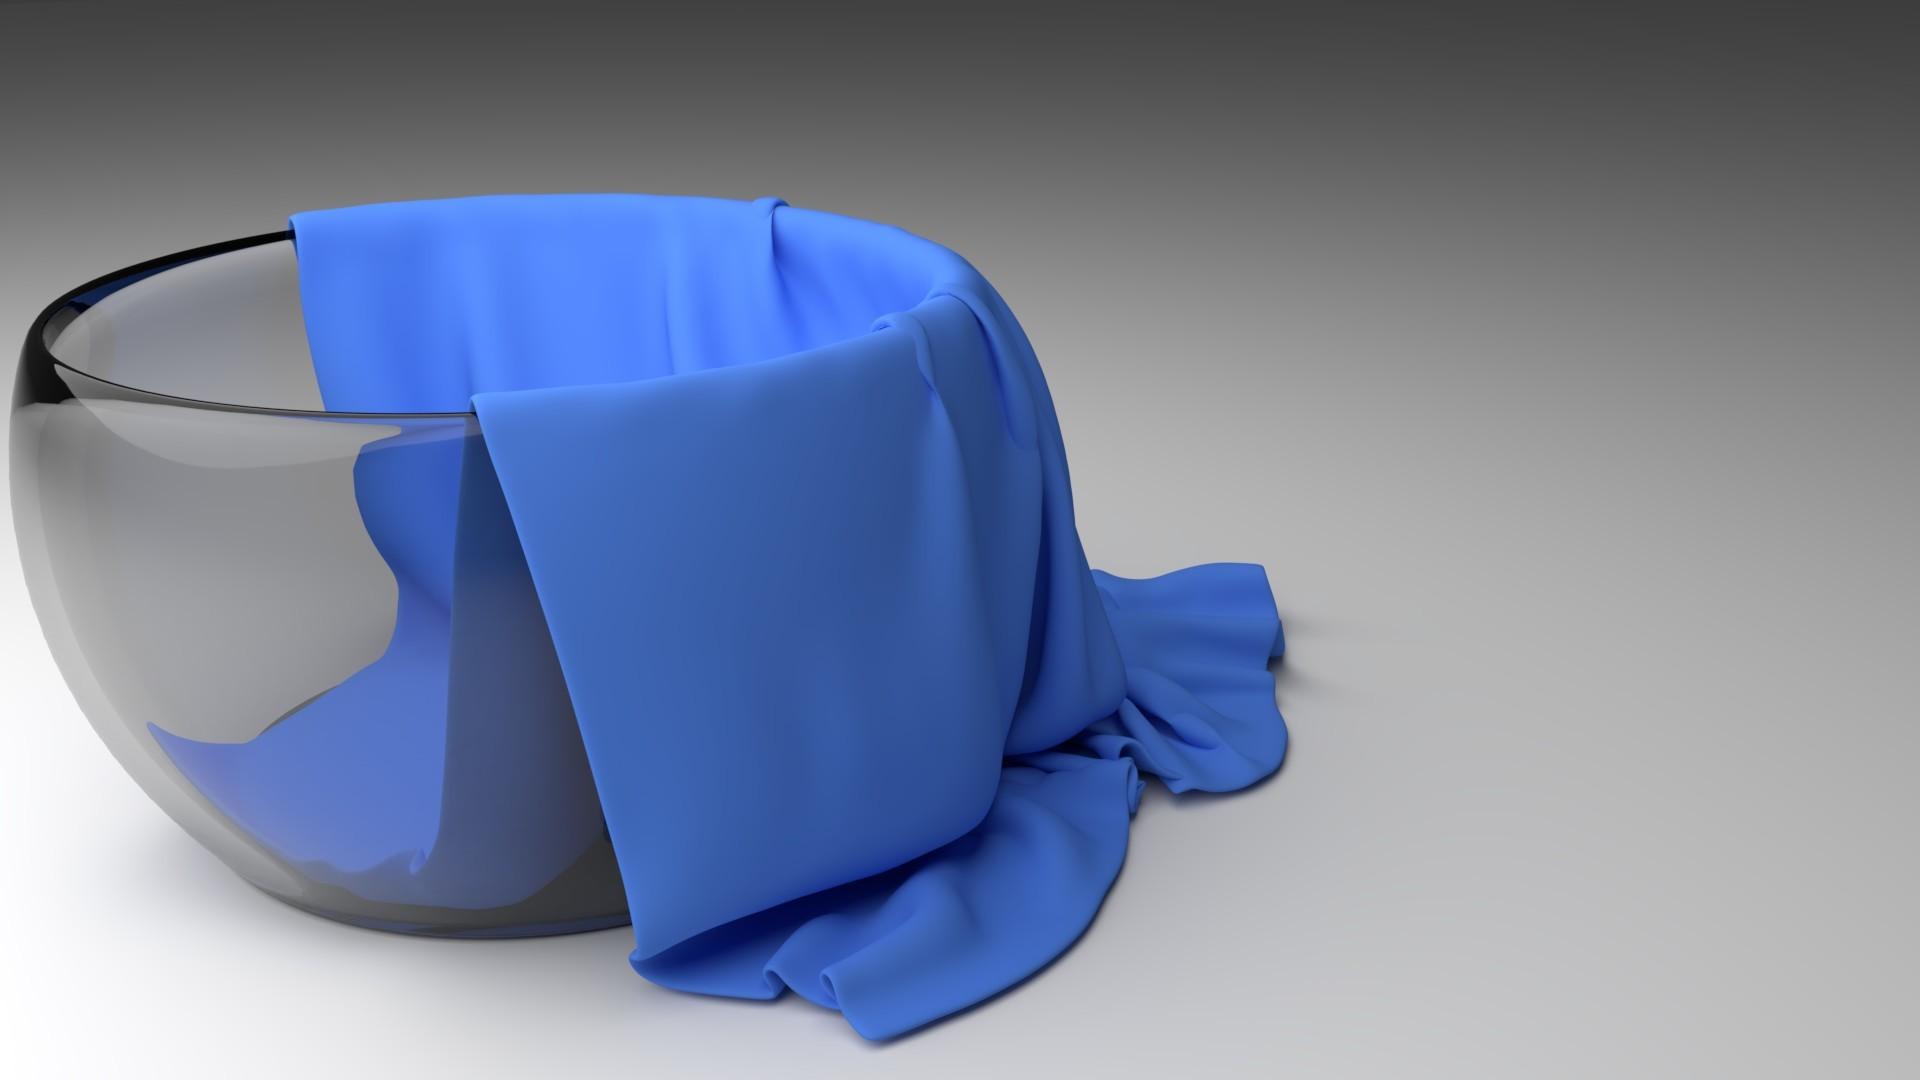 Phenomenal Marius Strauss A Clothbowl Cjindustries Chair Design For Home Cjindustriesco